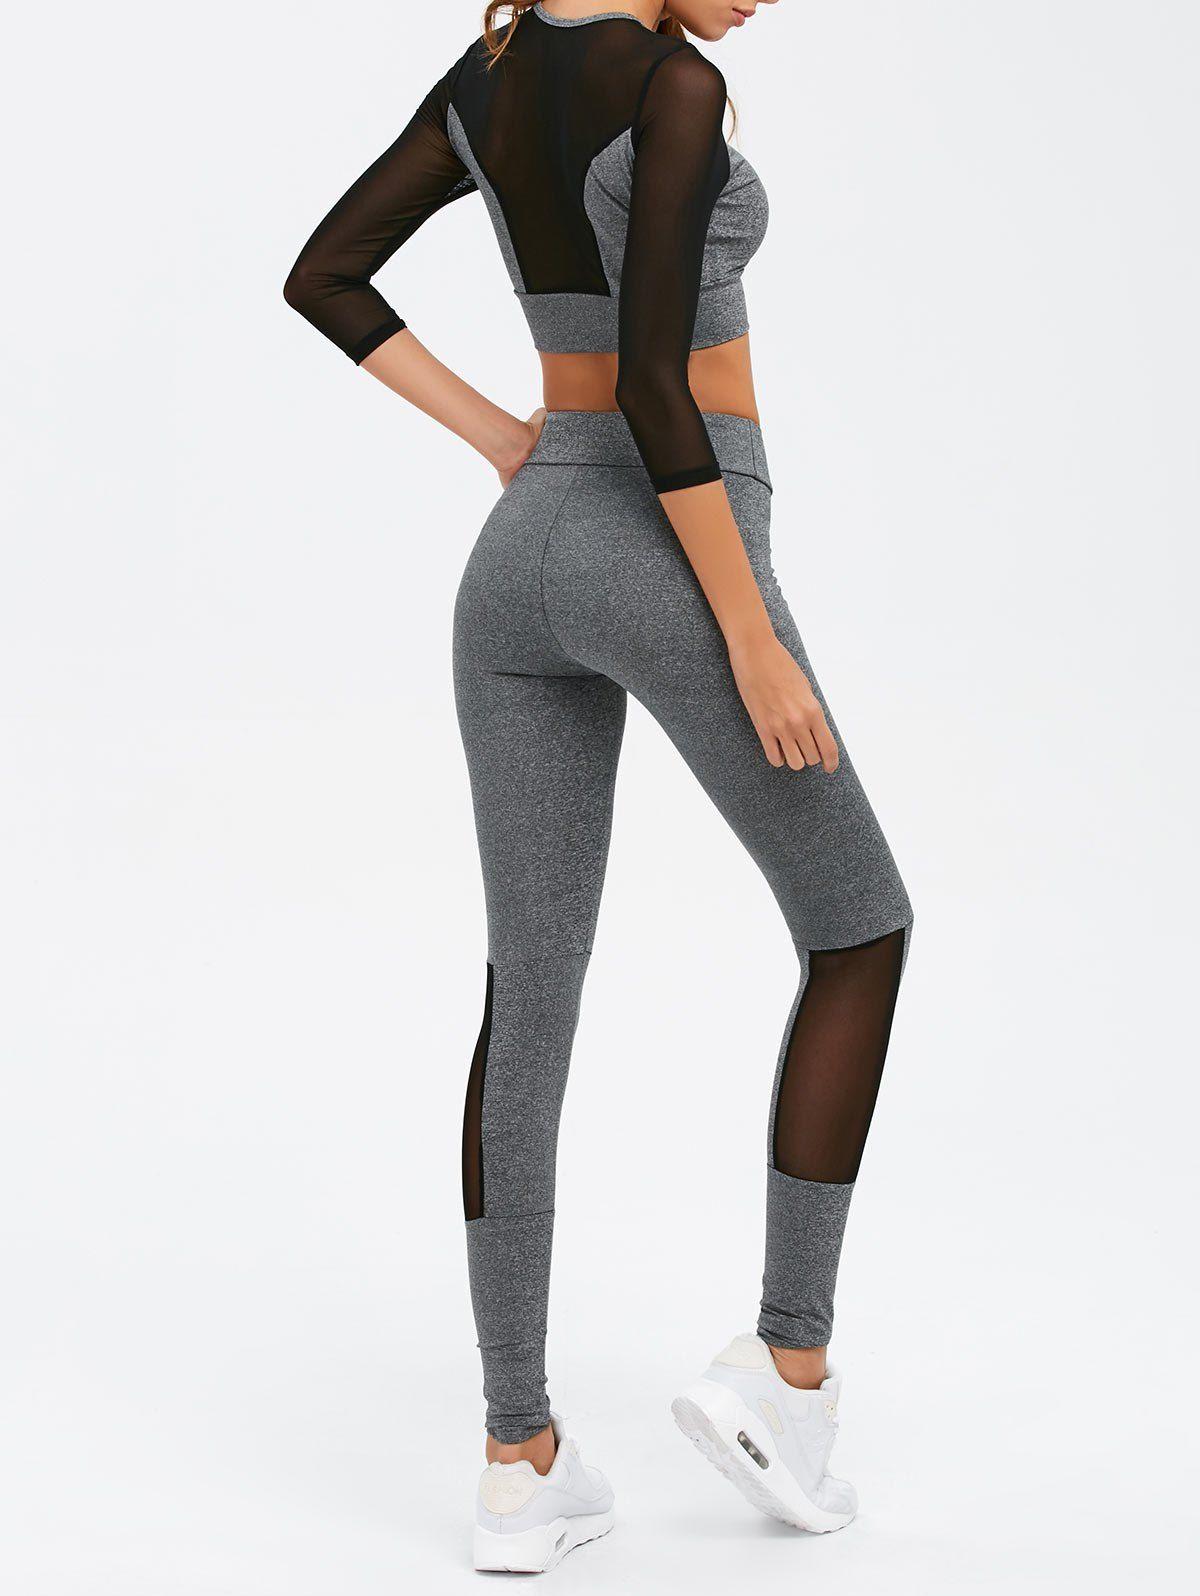 4aafbd9aab9 $21.02 for Mesh Spliced Skinny Sport Suit GRAY: Gym Sets | ZAFUL ...